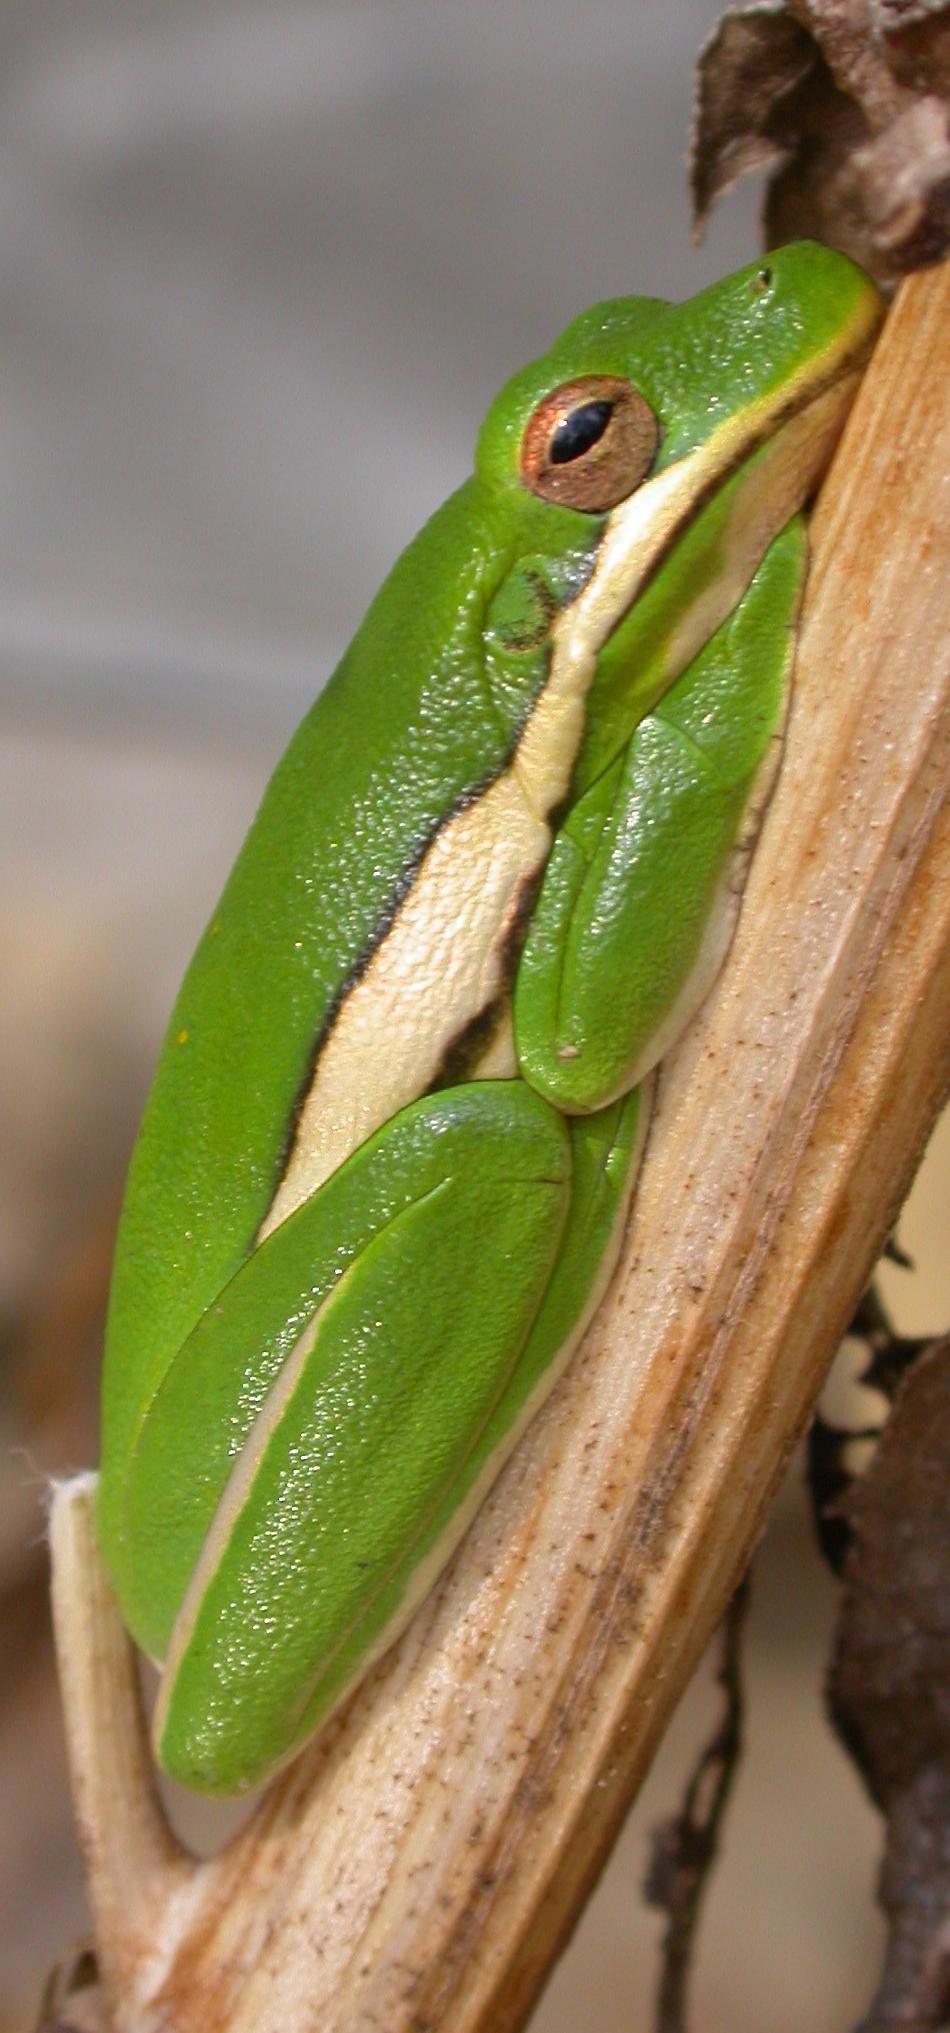 Green treefrog.